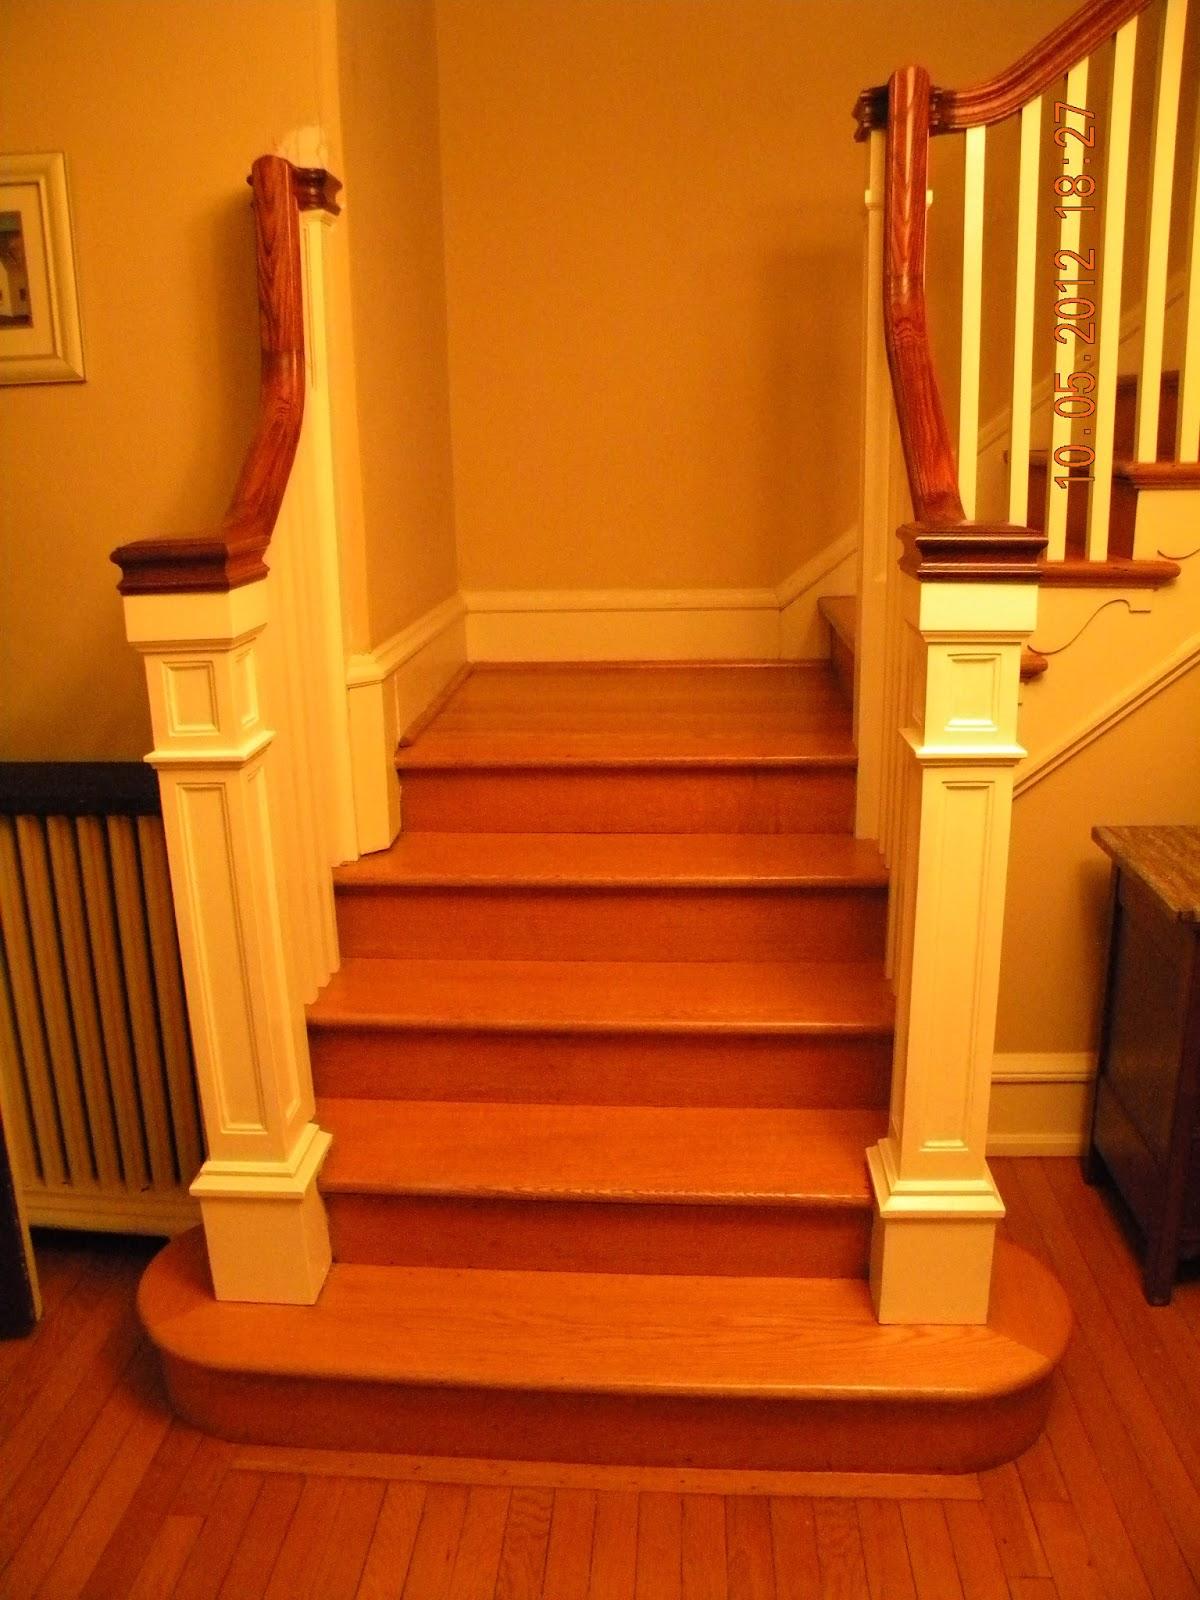 100 stair railings nj beautifying house with iron stair rai